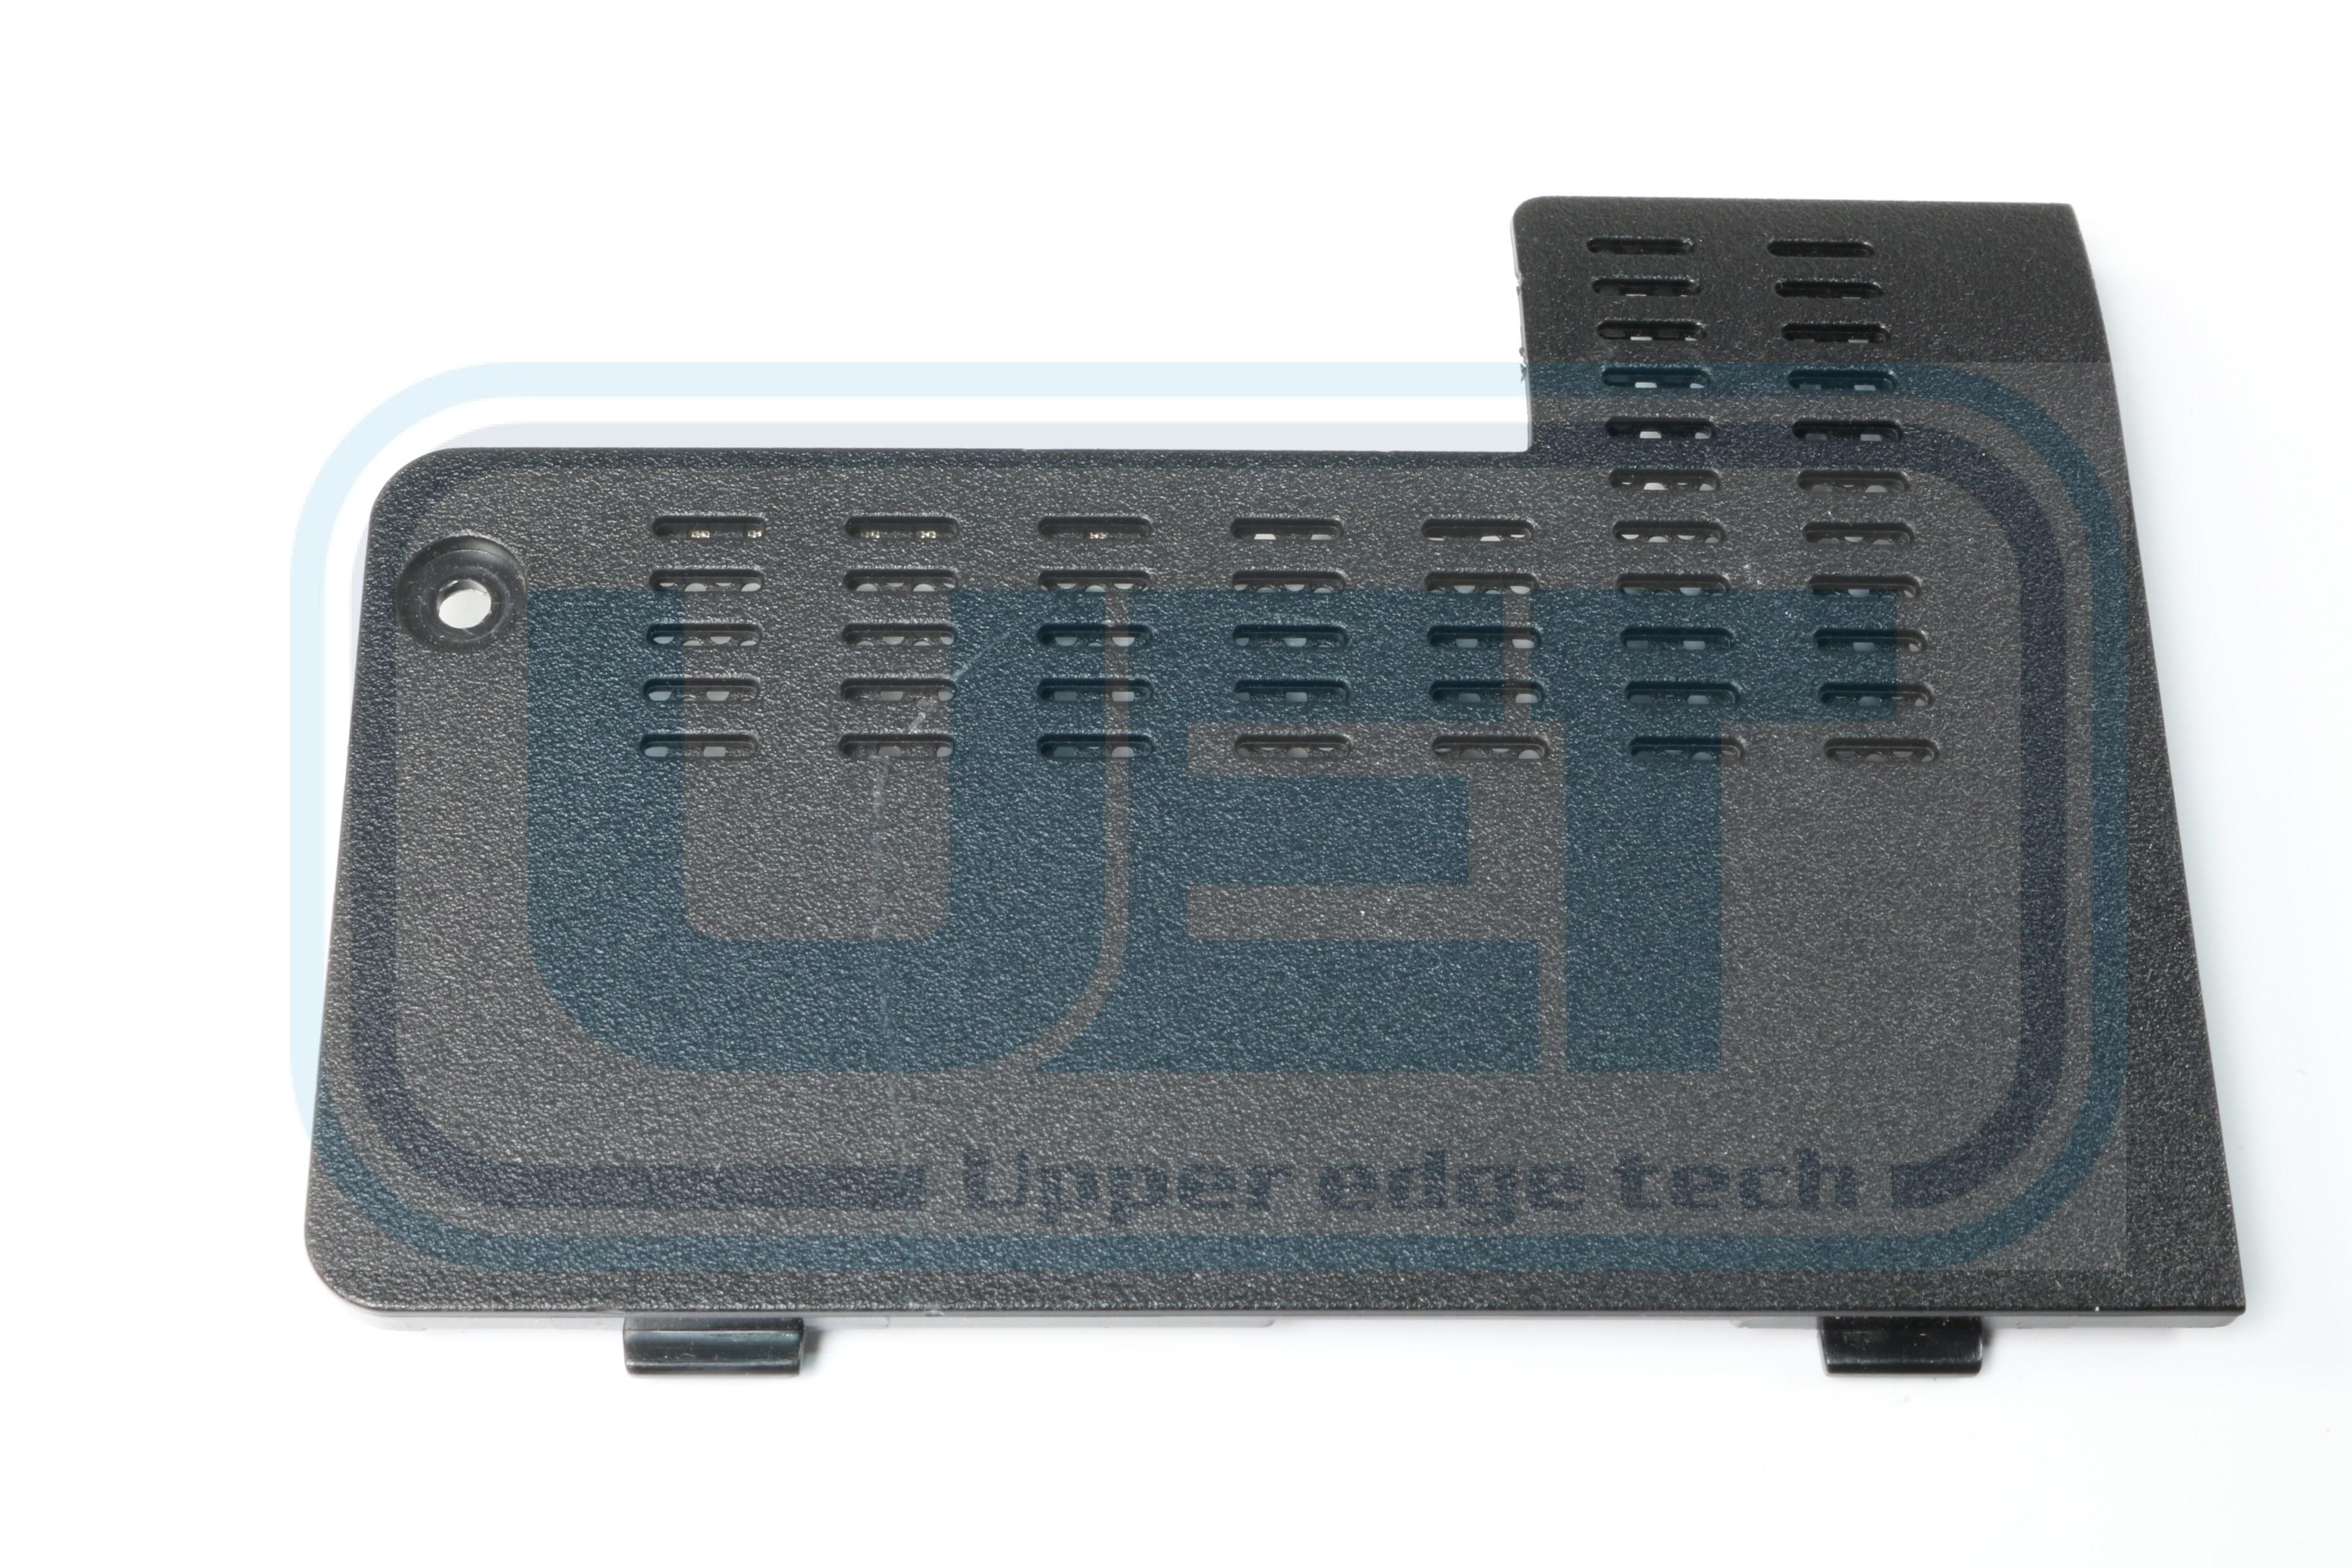 FAgdsyigao Portable 2.5 inch Hard Drive Enclosure,USB 2.0//3.0//3.1 Type-C Hard Drive Enclosure External HDD Case USB 2.0